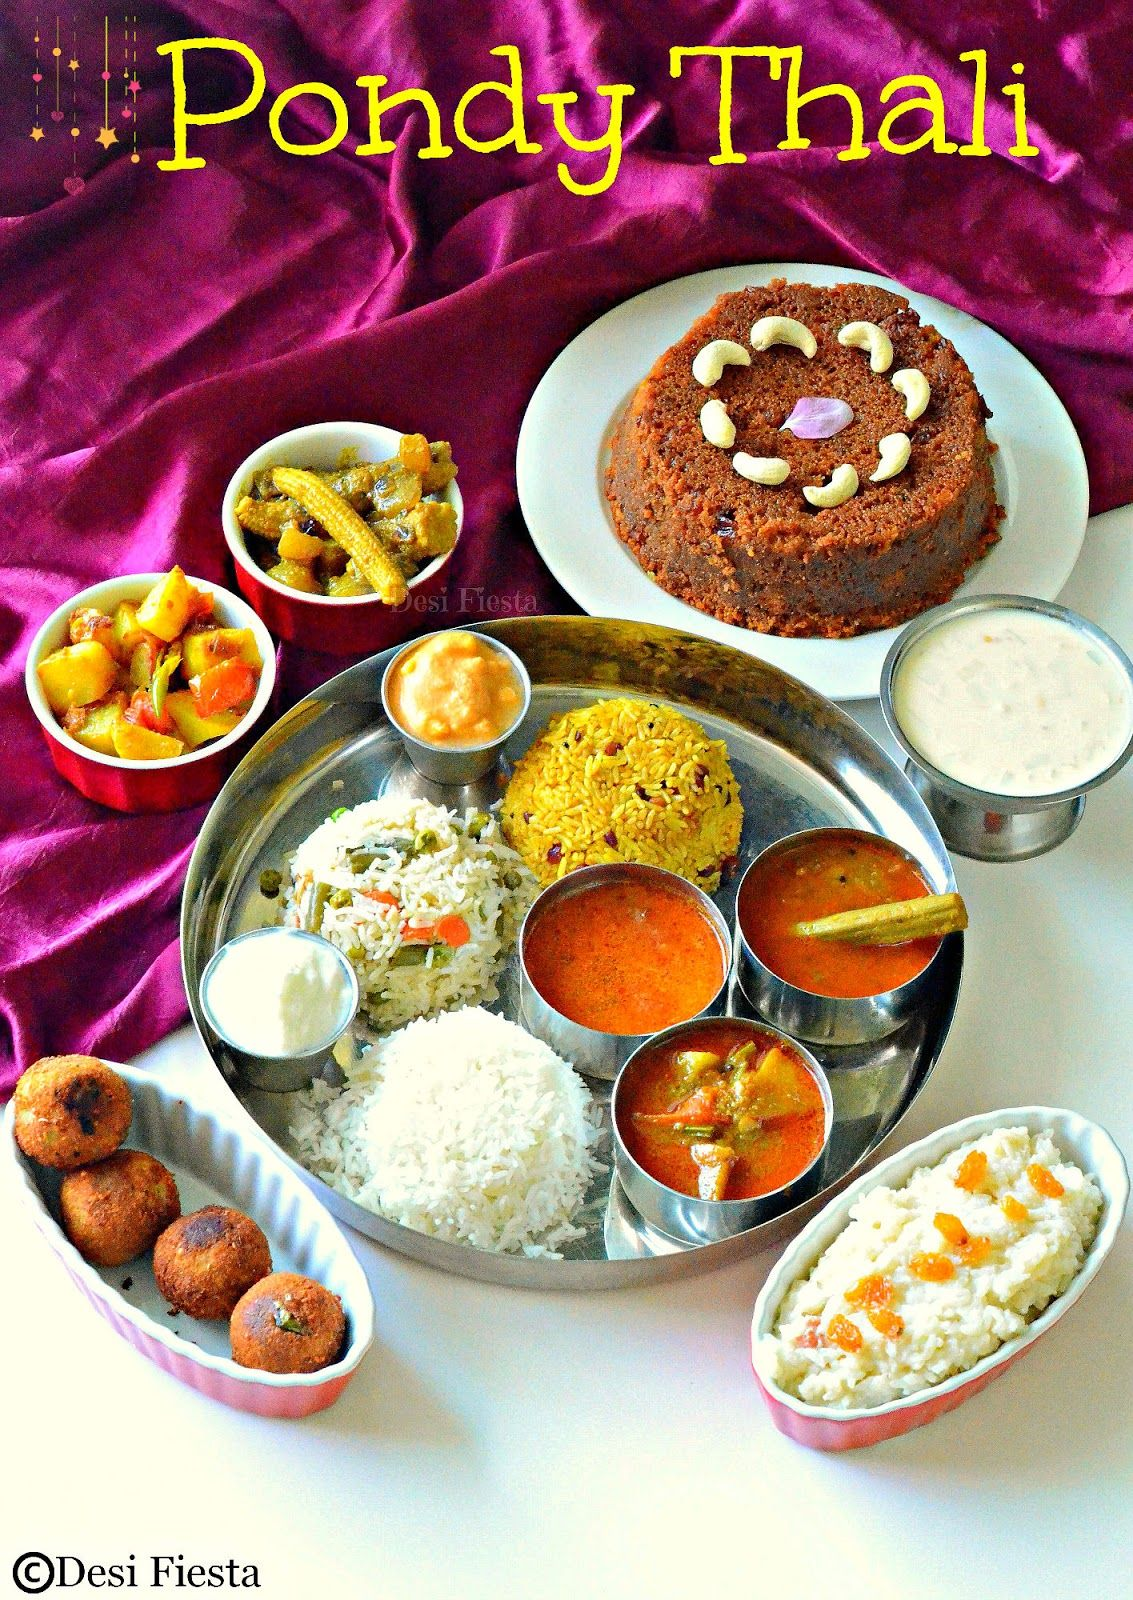 Desi fiesta pondicherry thali indian recipes pinterest desi fiesta pondicherry thali forumfinder Choice Image